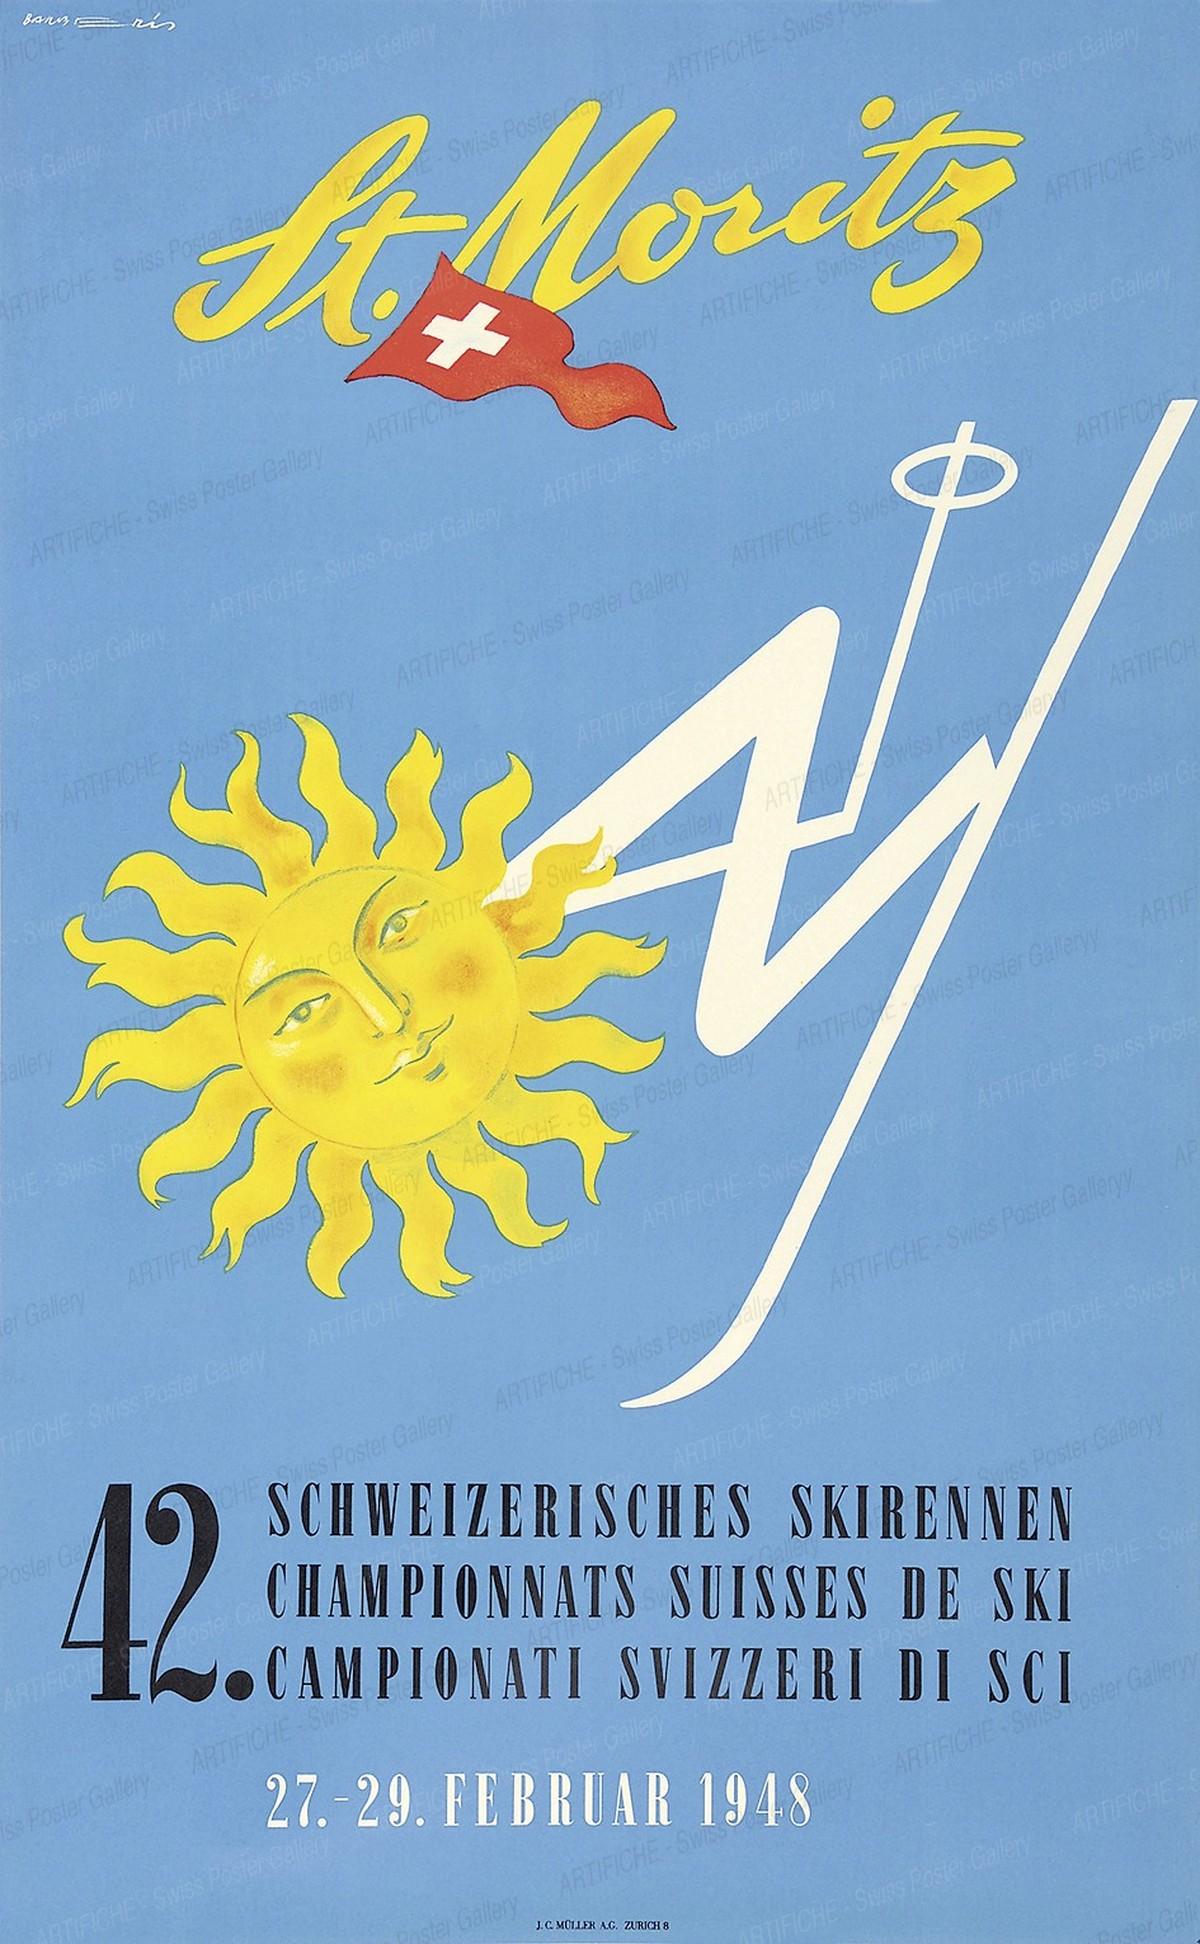 St. Moritz – 42. Schweizerisches Skirennen – 42. Championnats Suisses de Ski – 42. Campionati Svizzeri di Sci – 27.-29. Februar 1948, Franco Barberis